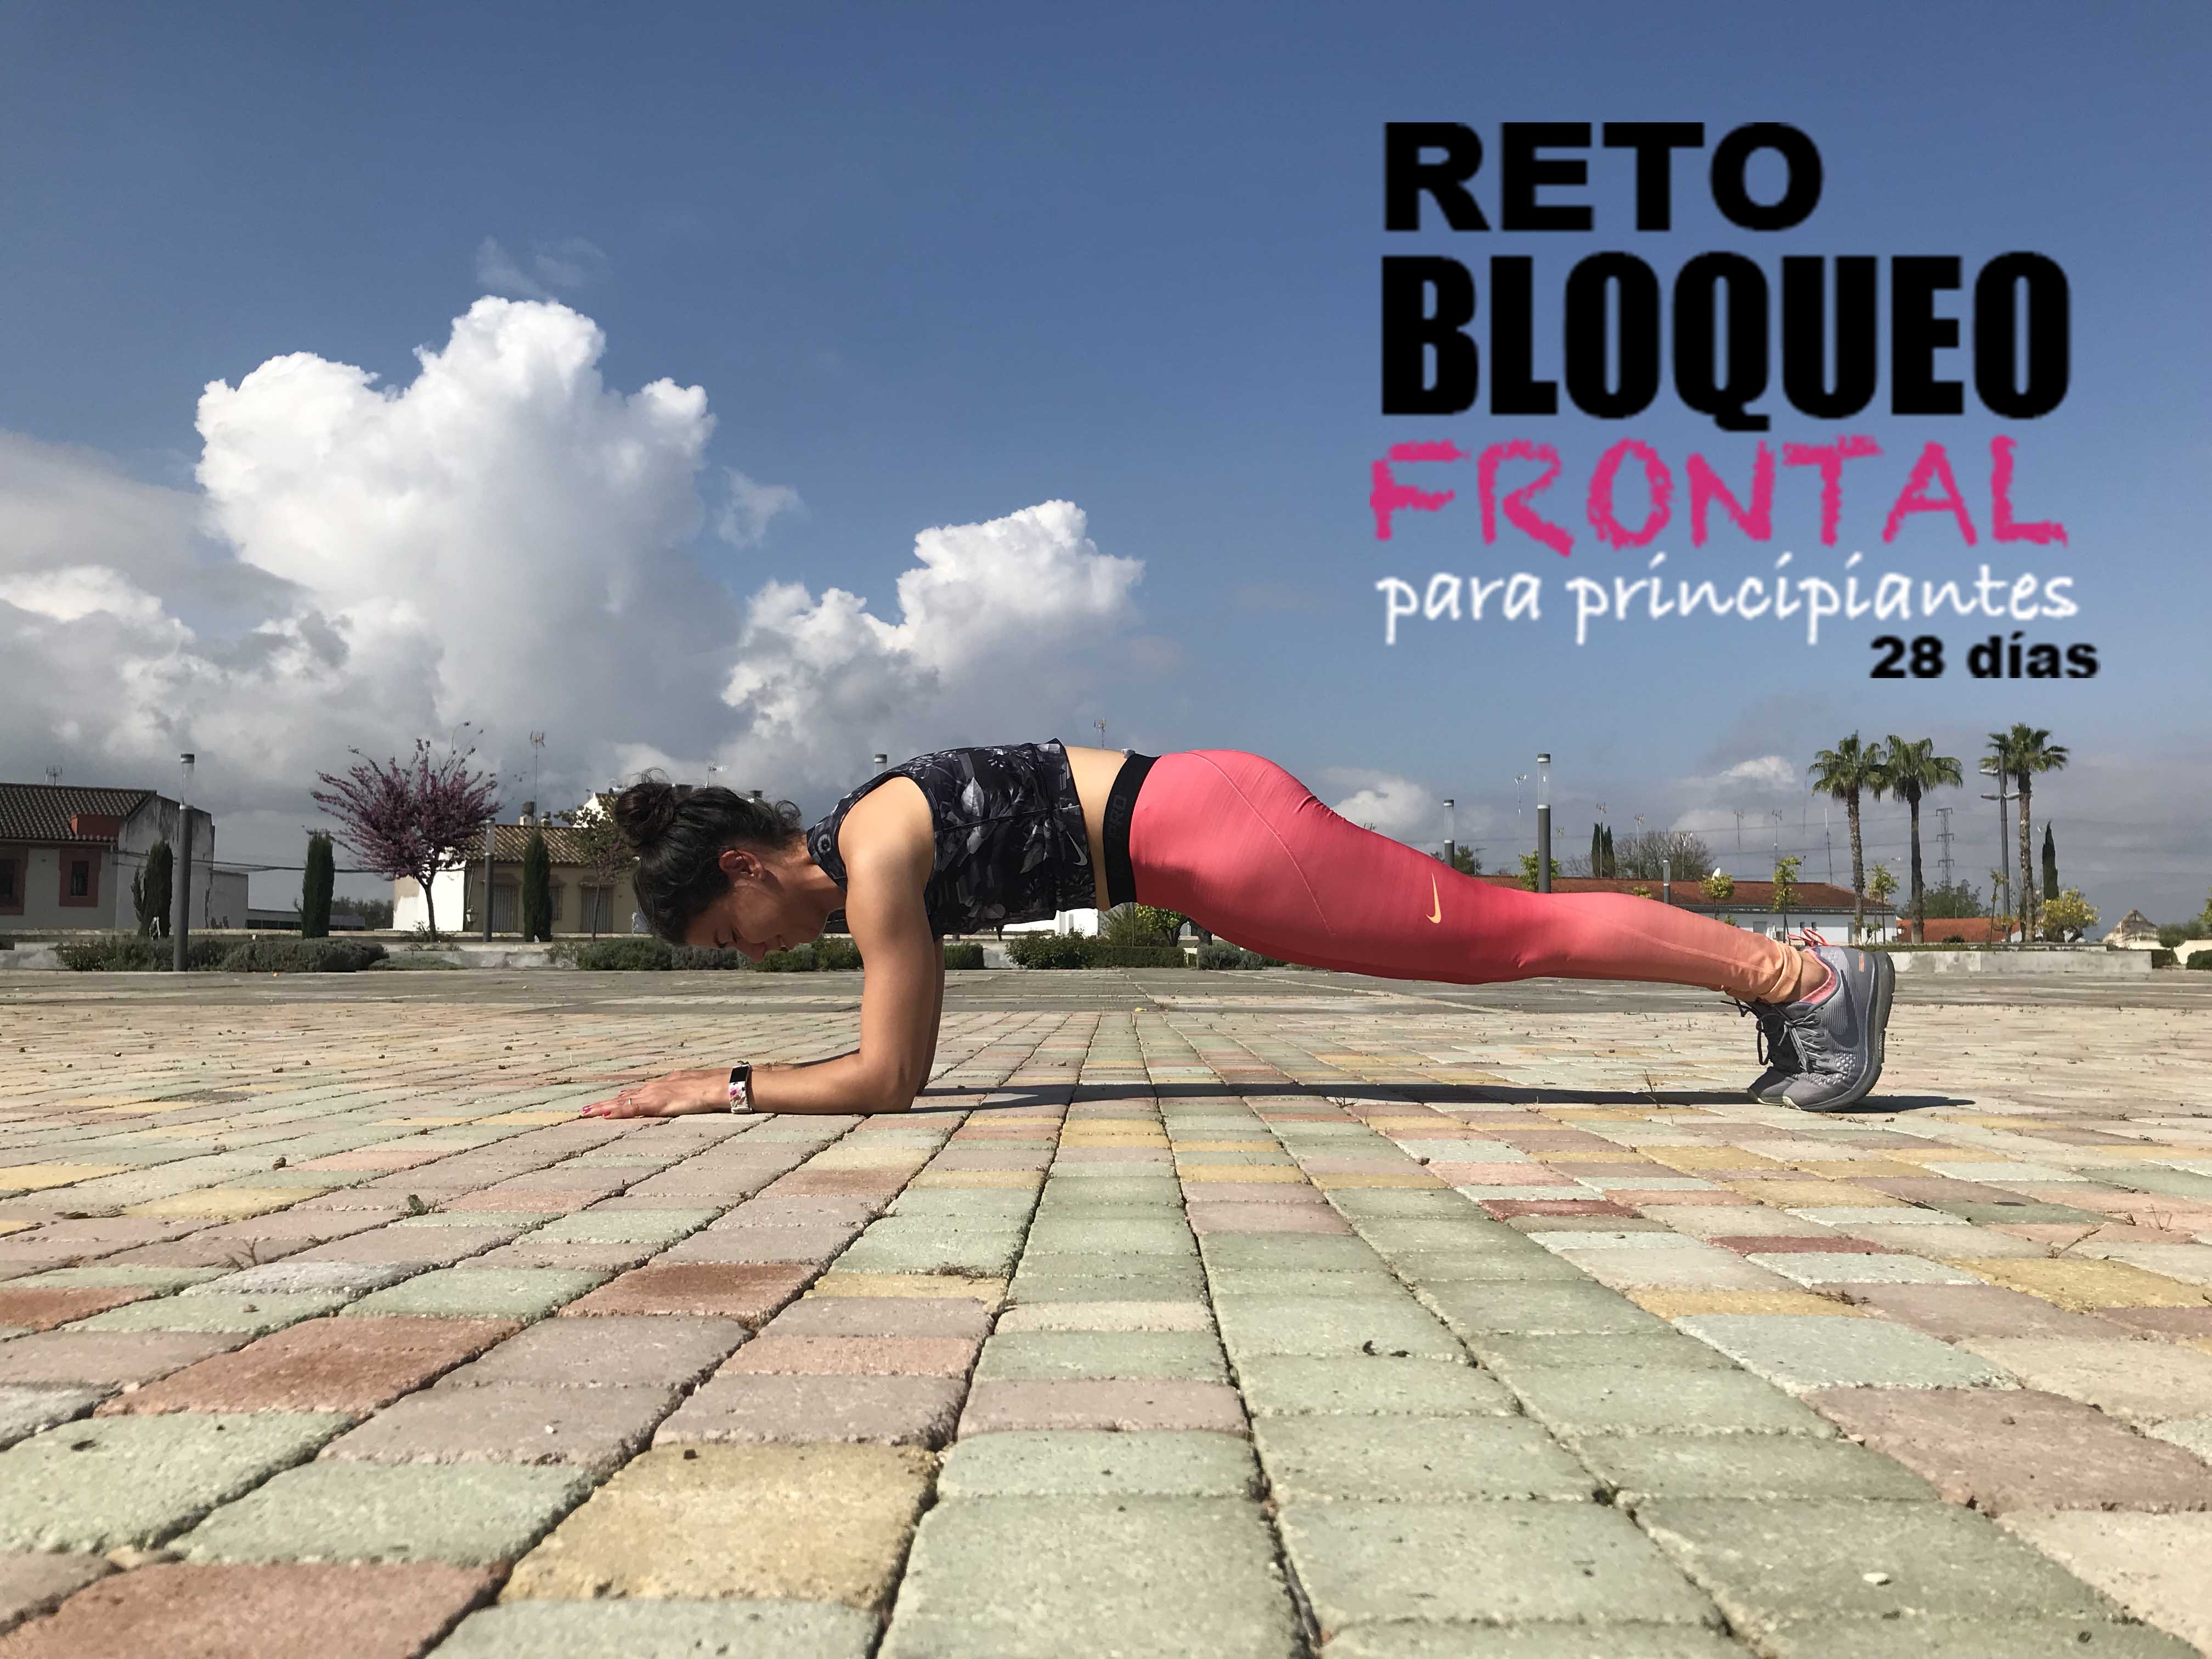 RETO BLOQUEO FRONTAL PRINCIPIANTES MTRAINING